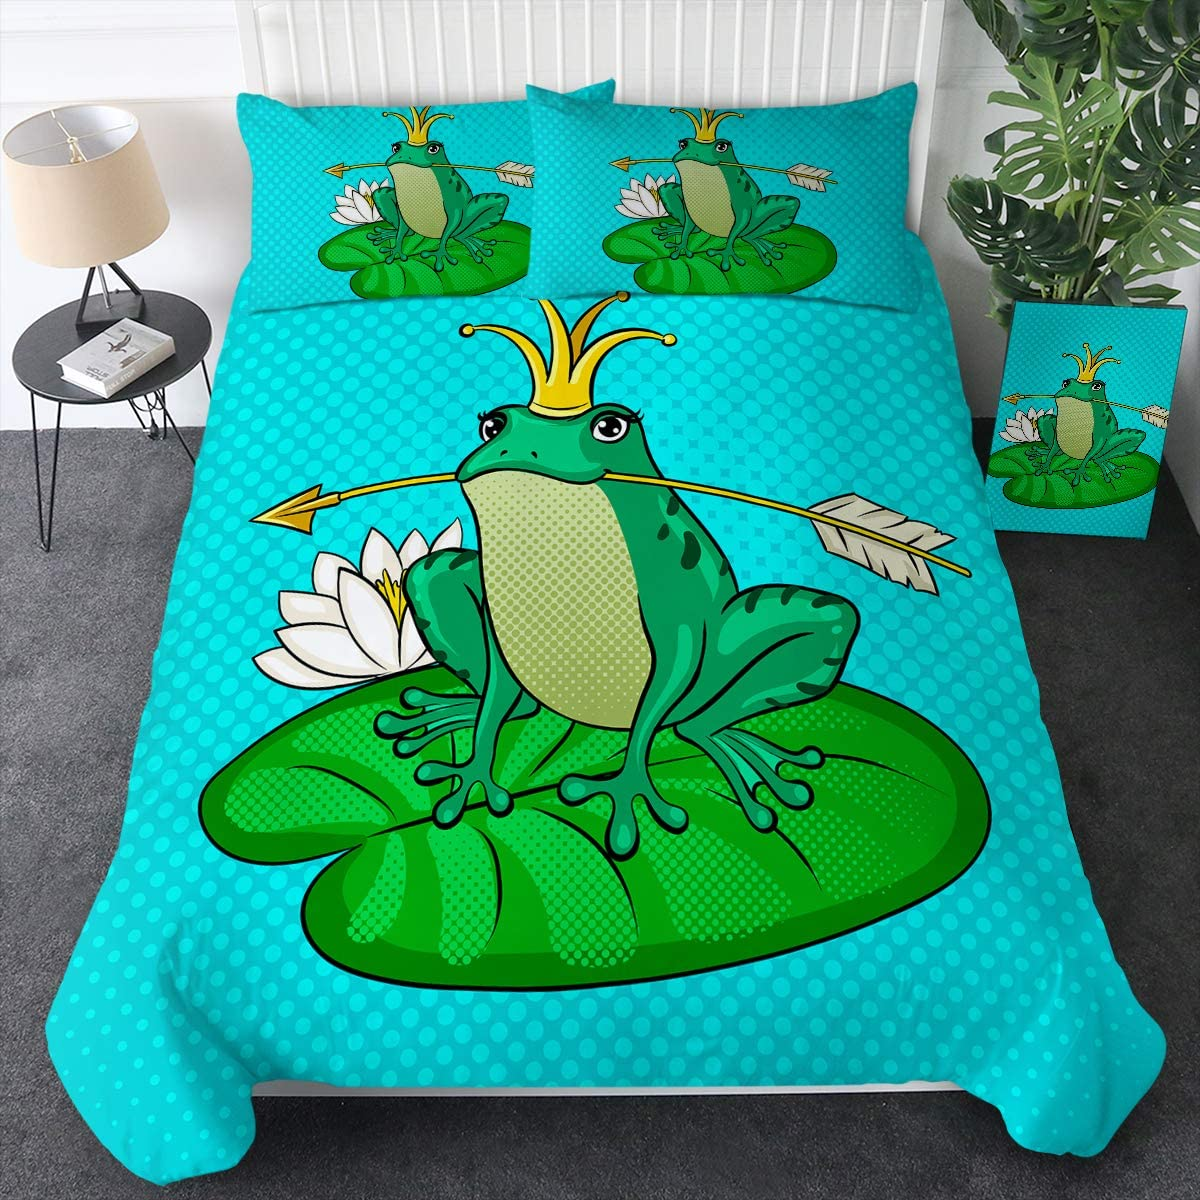 Sleepwish Animal Duvet Cover Set Girls Boys Cute Princess Frog Fairytale Pop Art Pattern Bedding Sets 3 Pieces Kids Teens Green Blue Bedspread Funny Trendy and Modern (Full)